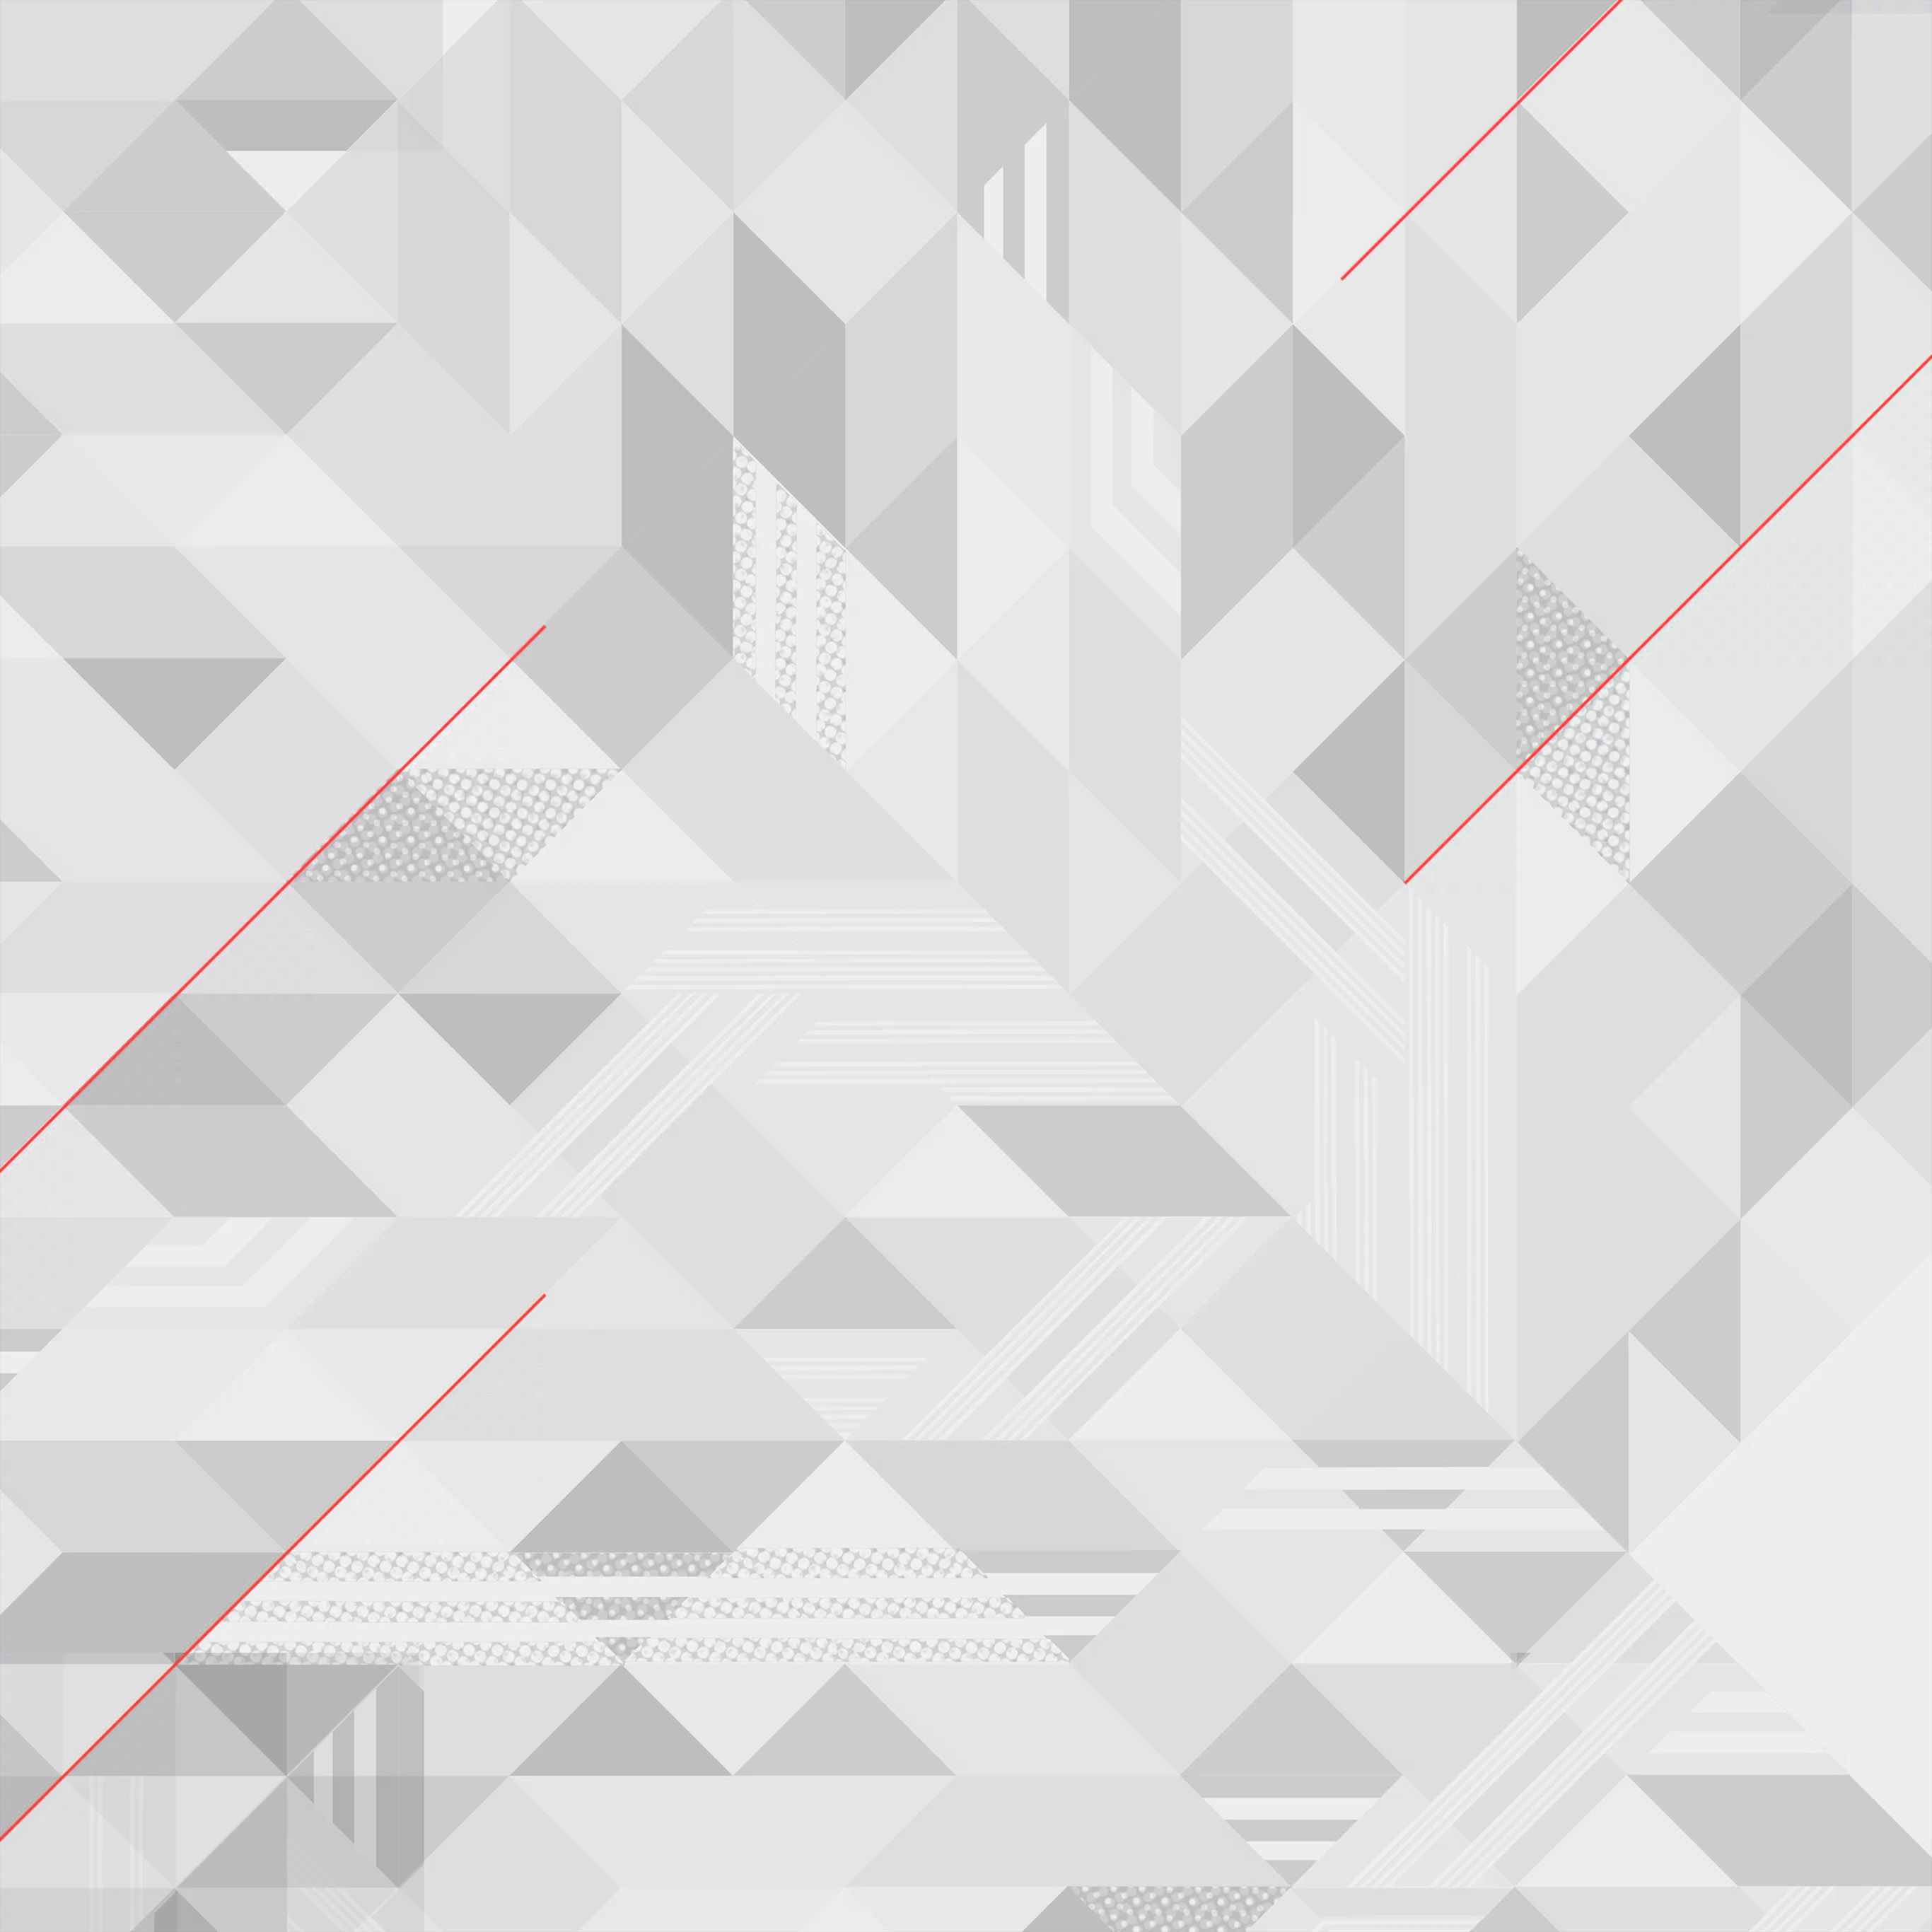 Details About Fine Decor Marblesque Marble Wallpaper Grey Marble Wall Paper 39889 Hd Wallpaper Backgrounds Download